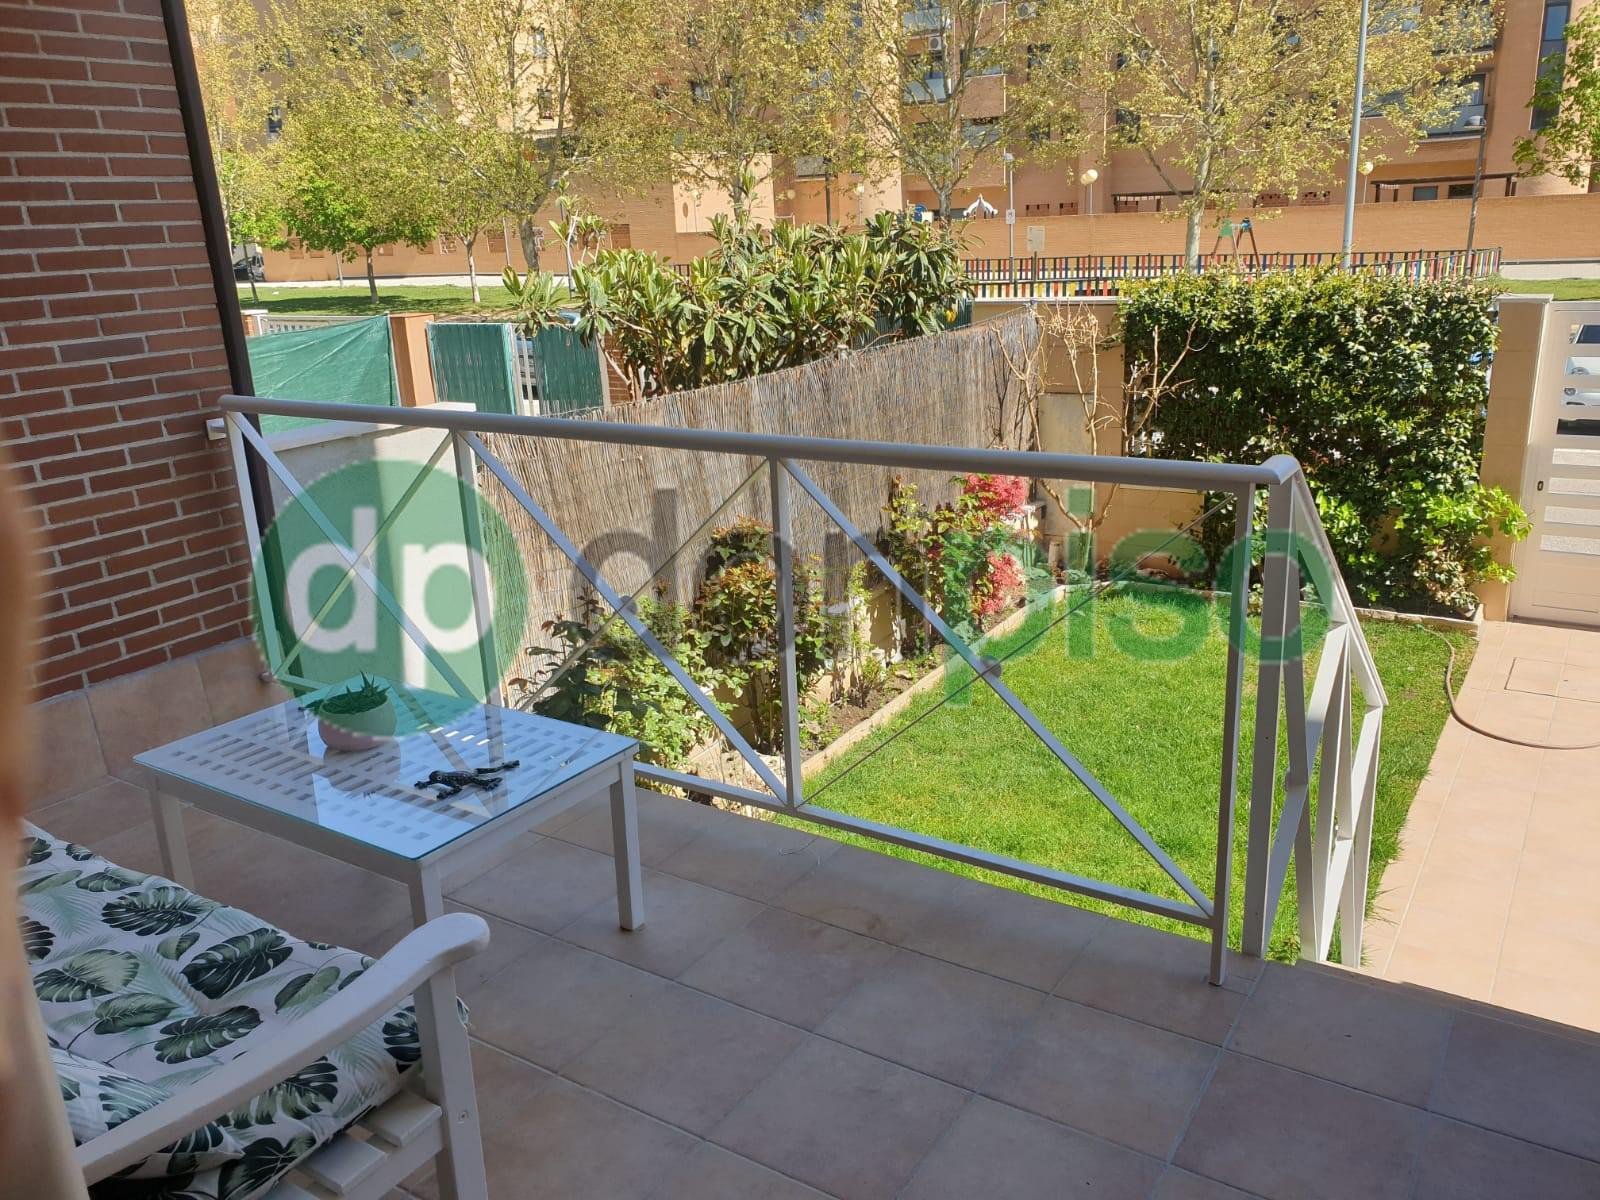 Imagen 2 Casa Adosada en alquiler en Azuqueca De Henares / Zona Plaza 3 de Abril